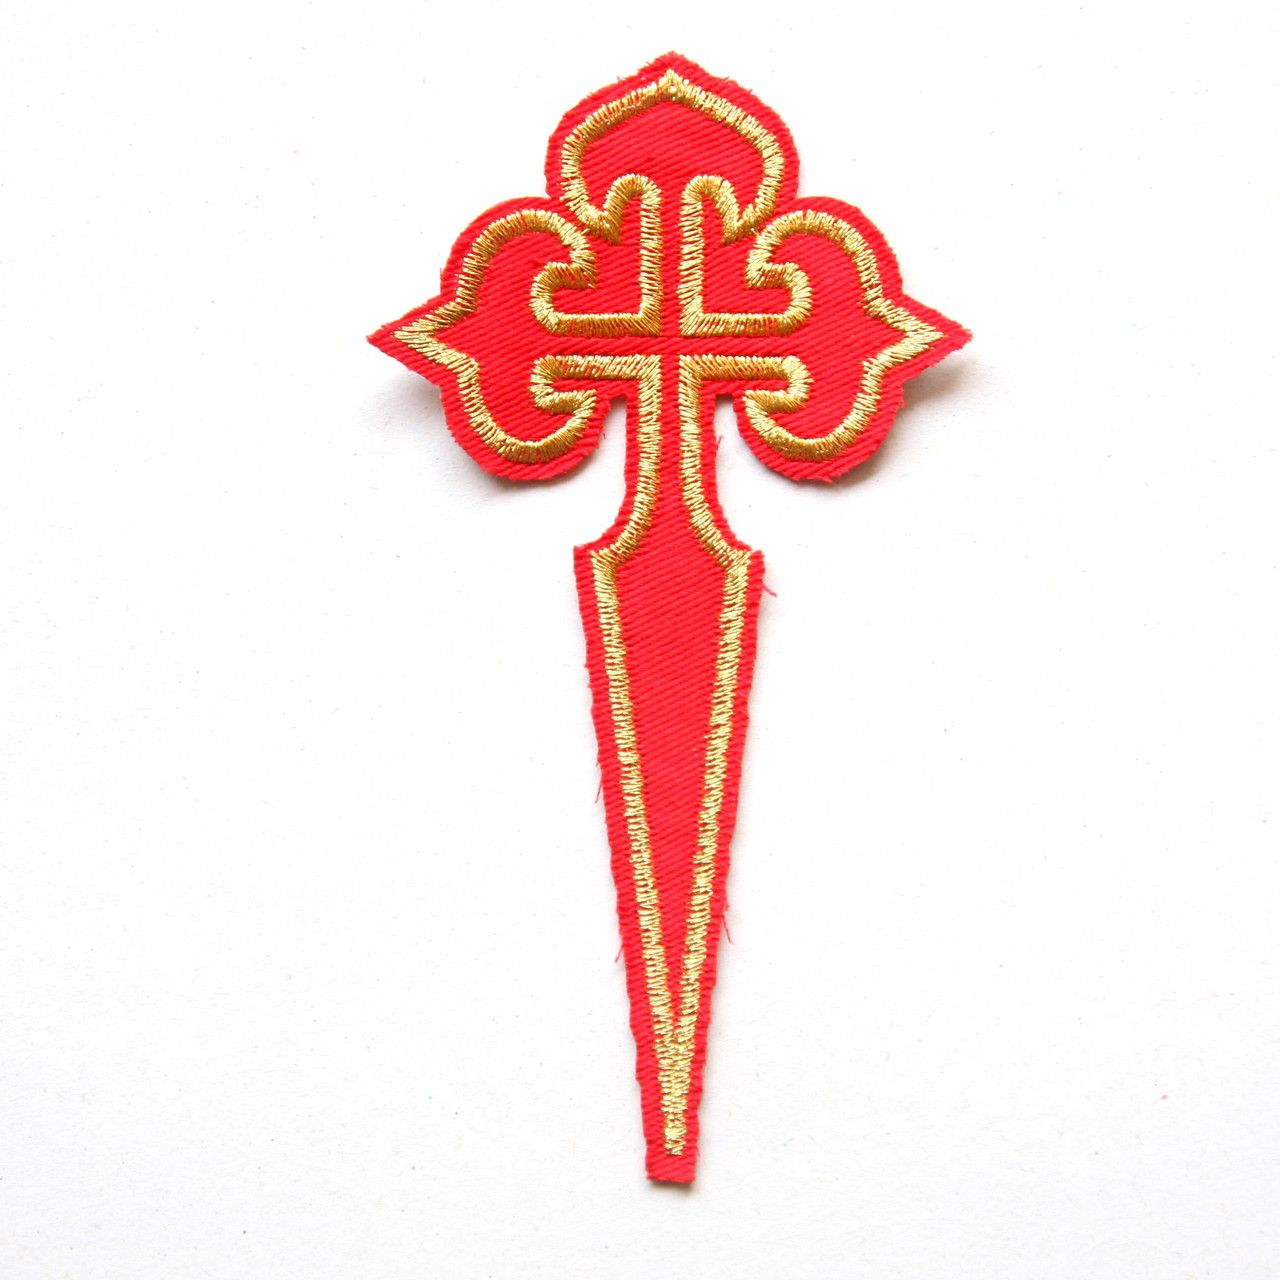 (http://www.spanishdoor.com/camino-de-santiago-pilgrim-st-james-way-cross-cloth-patch-new/) #Camniodesantiago #Stjamescrosspatch